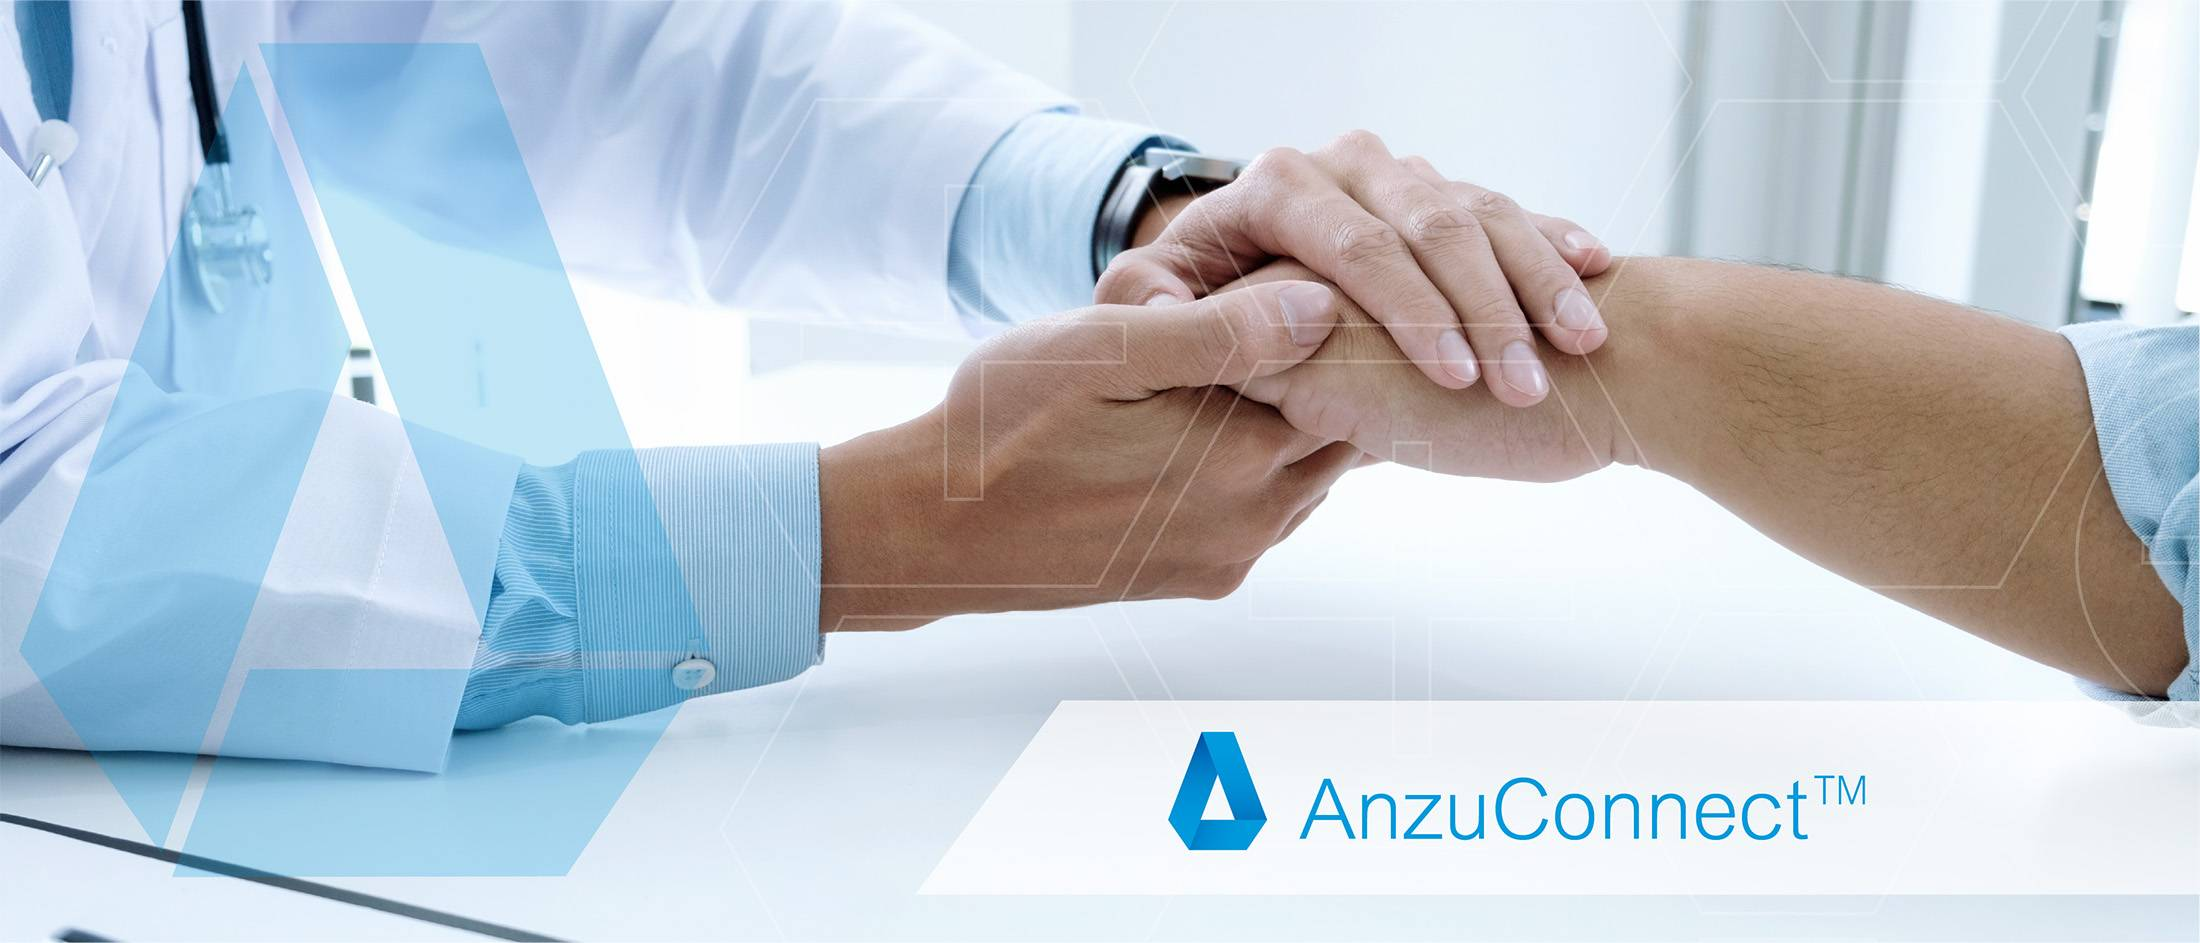 Anzu Connect